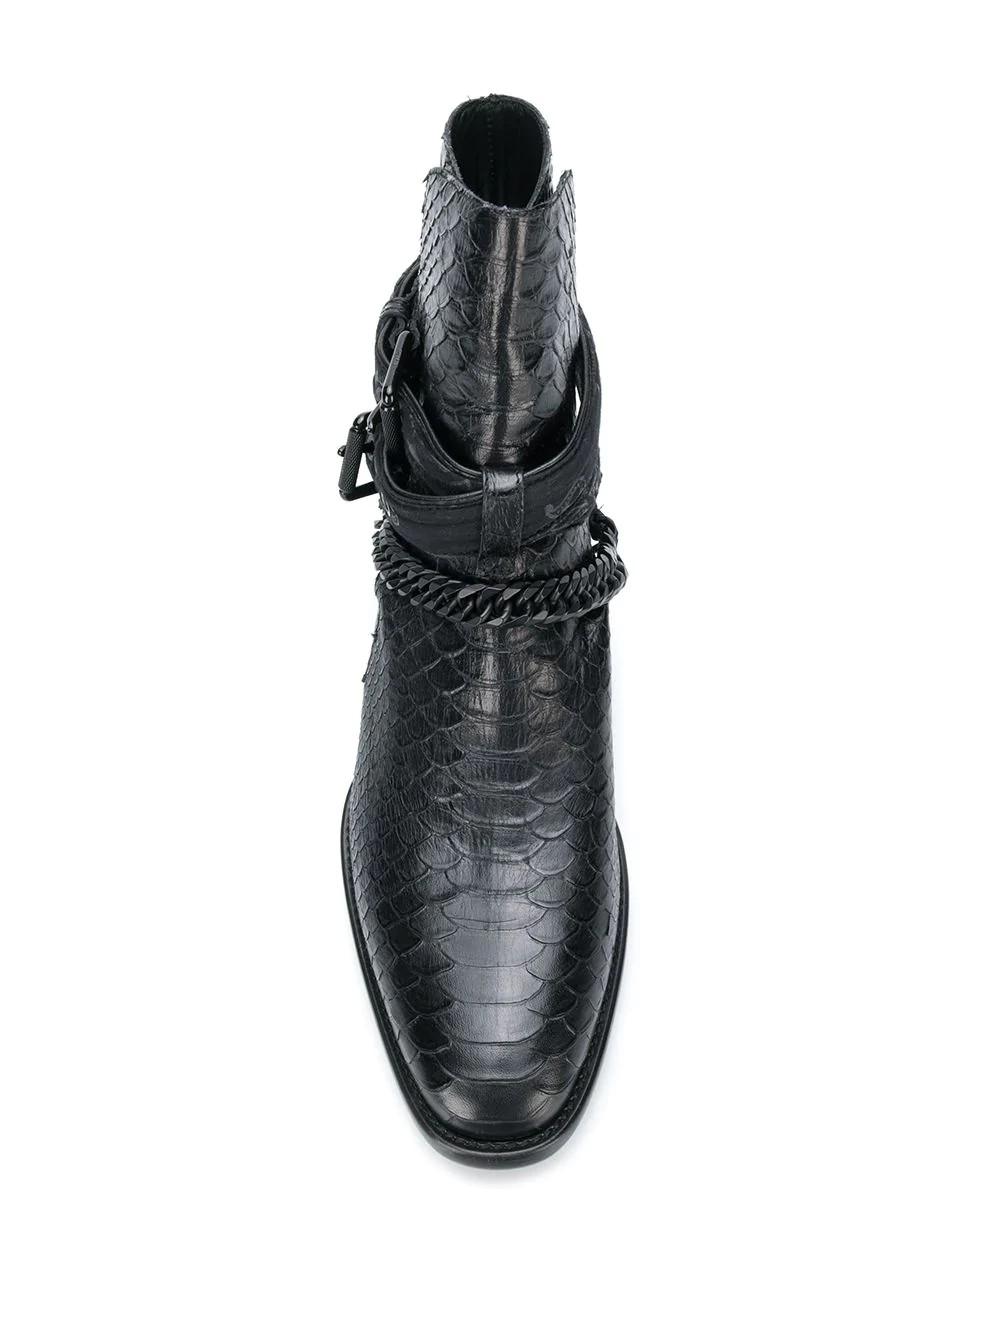 Buckle Chain Boot